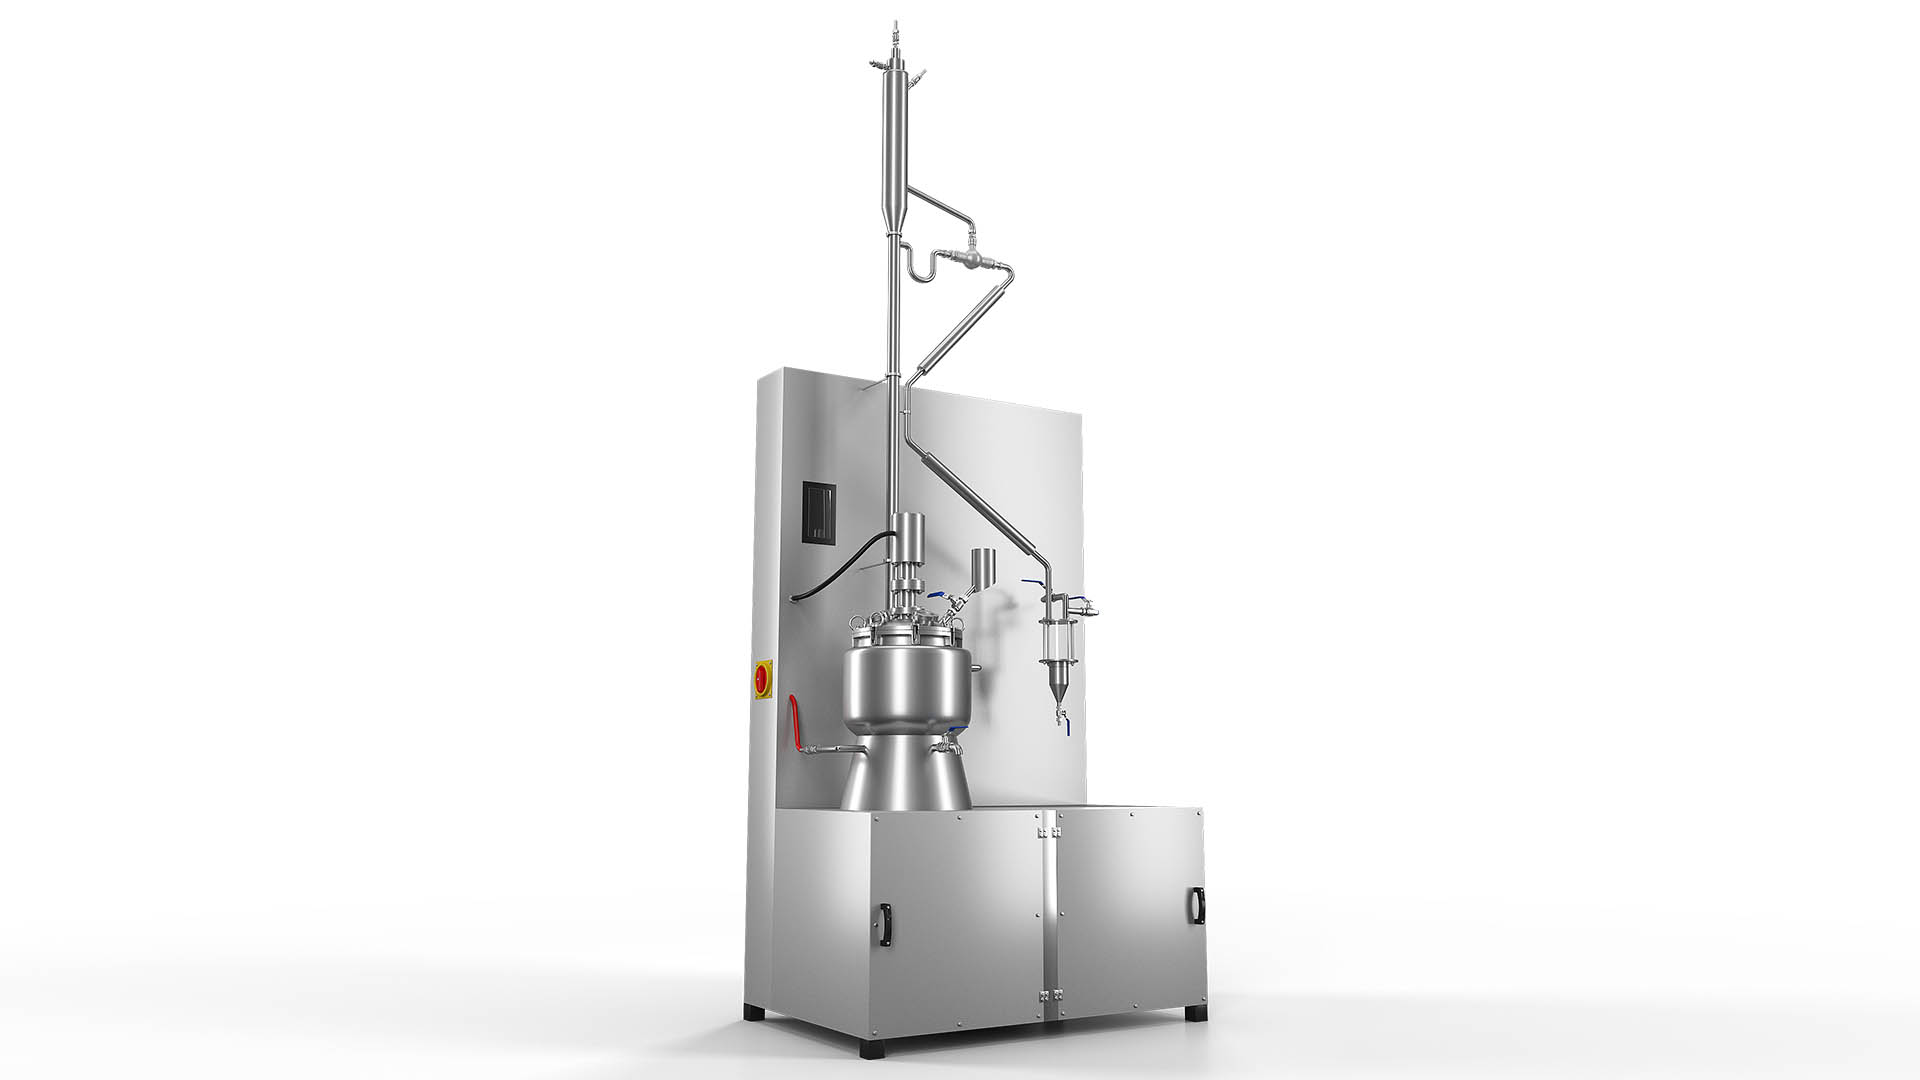 Sebat Rose Oil and Essential Oils Fractional Distillation Unit